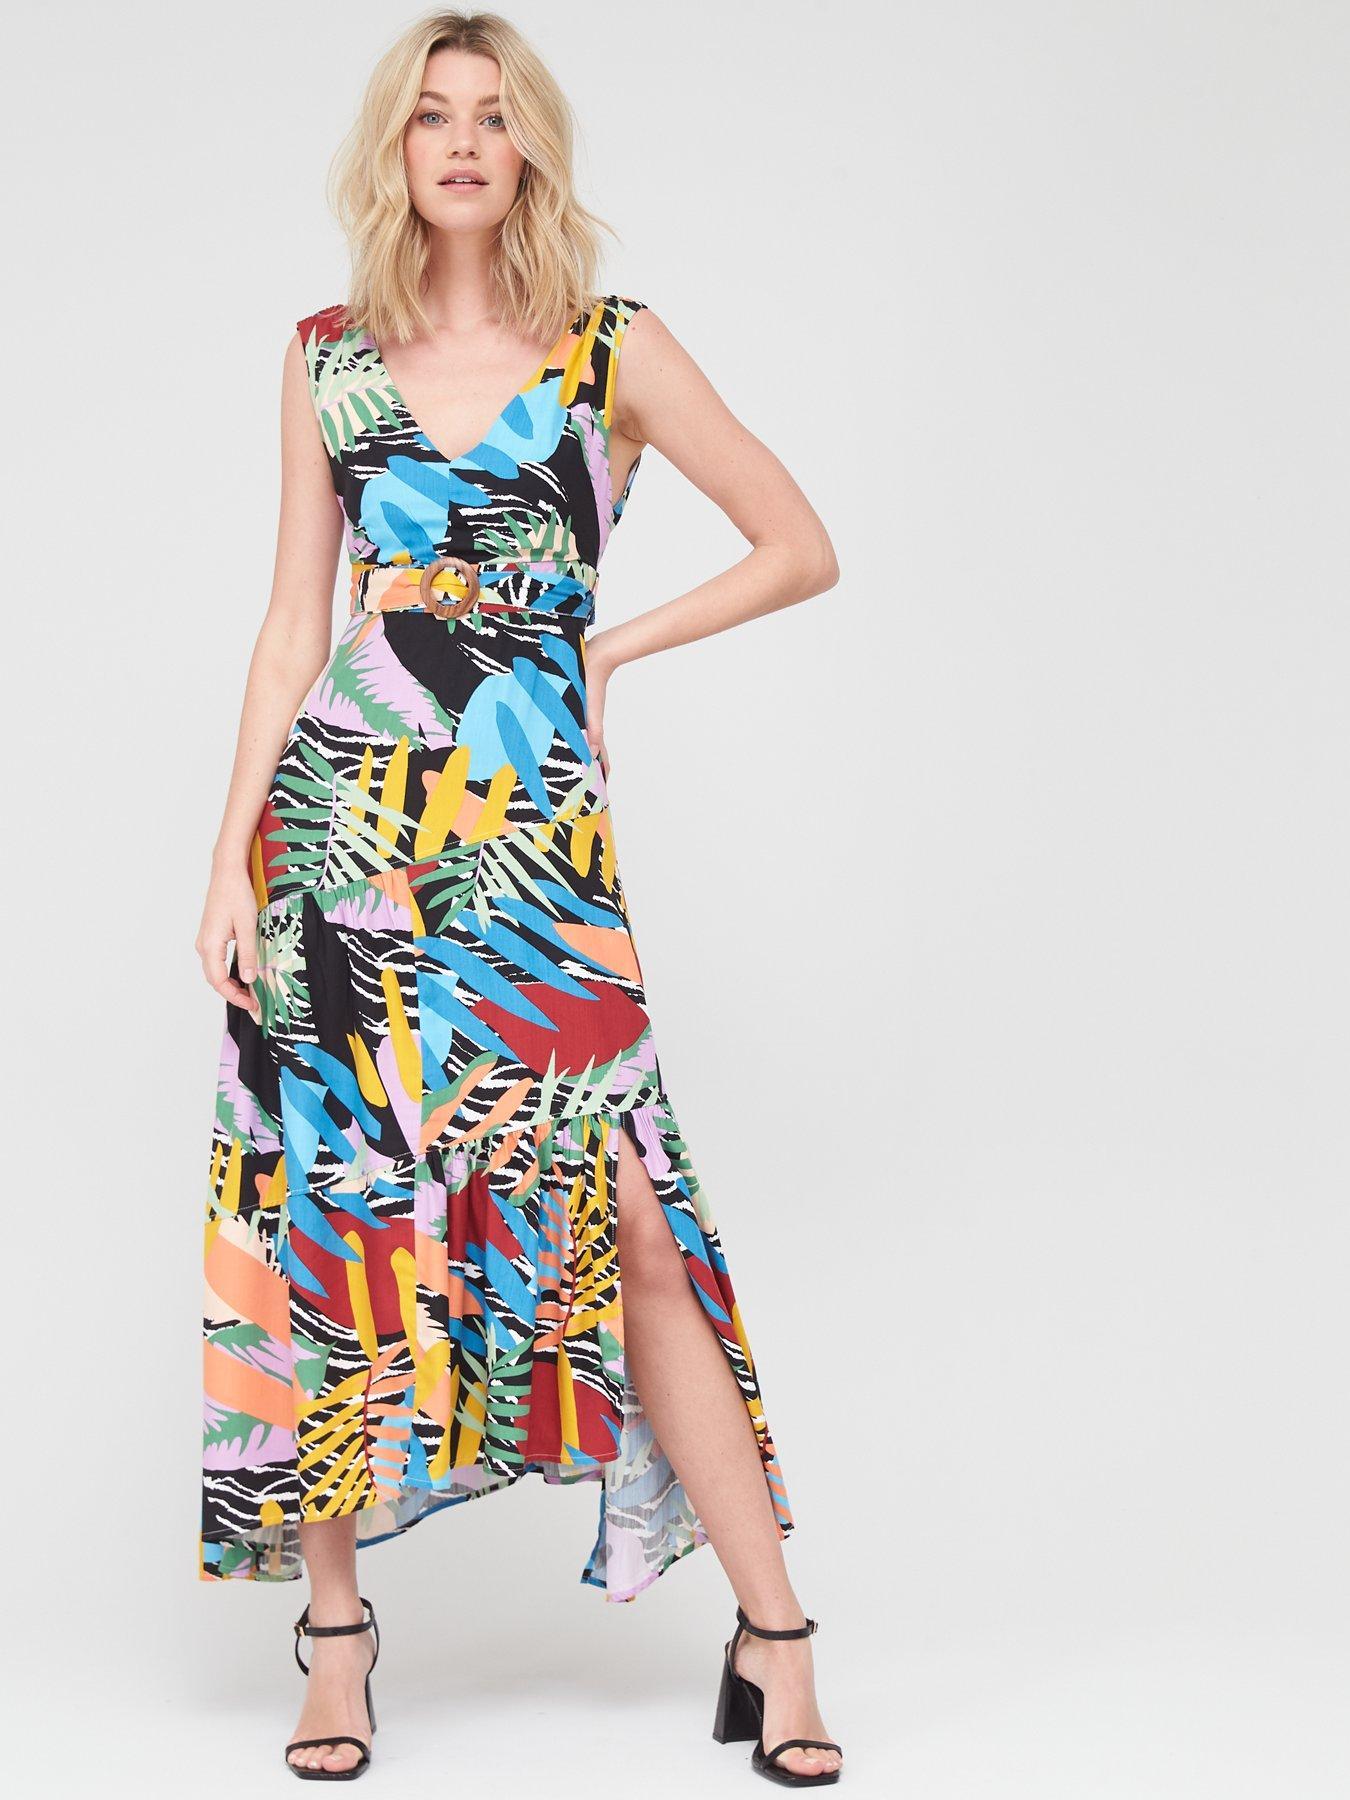 Aqua Womens Size XS Black Lace Inset Asymmetrical Bodycon Sleeveless Dress